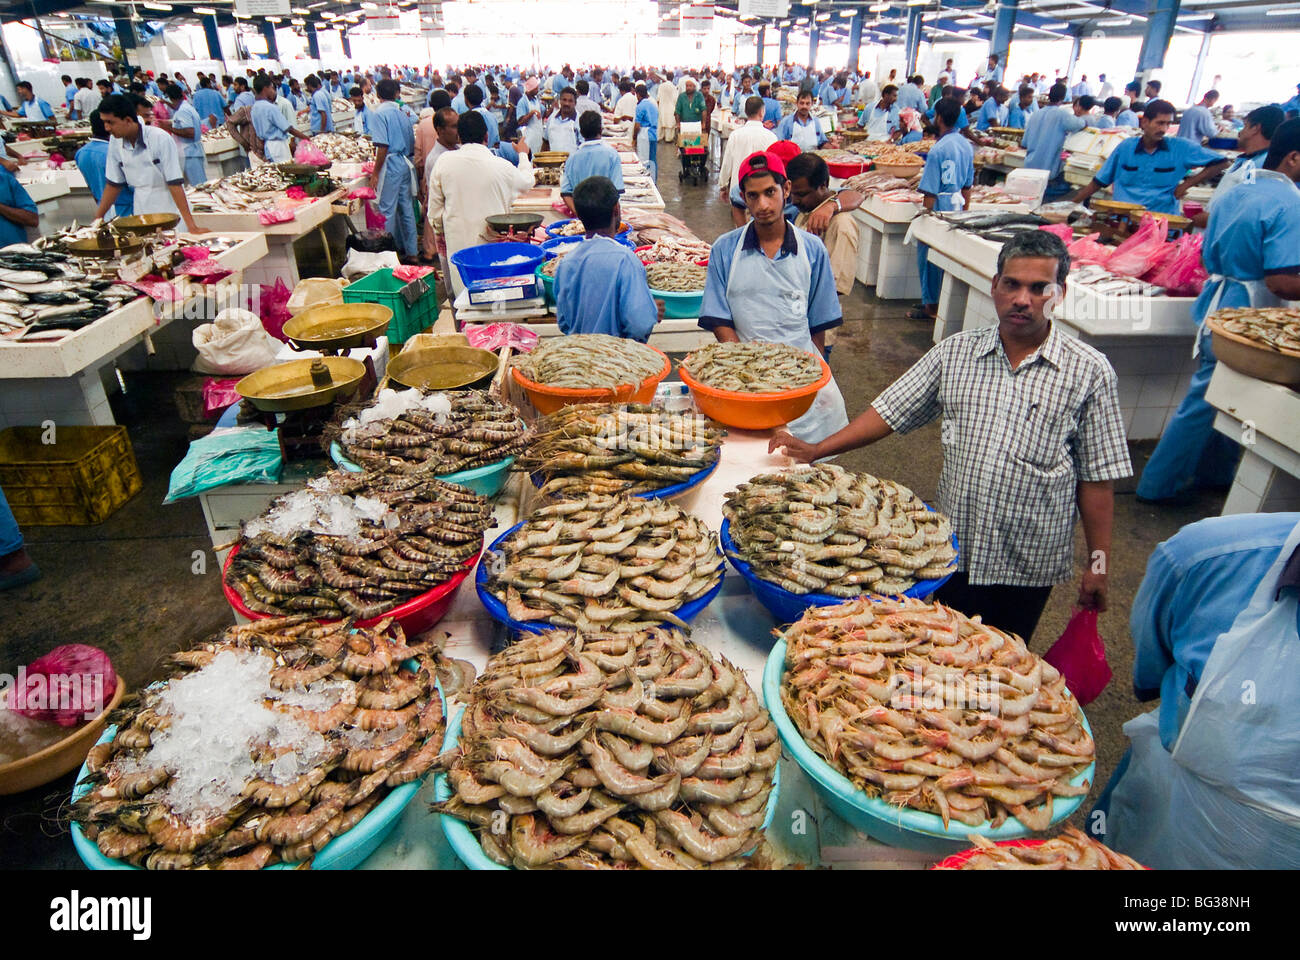 Fish market dubai united arab emirates middle east for Fish market hours